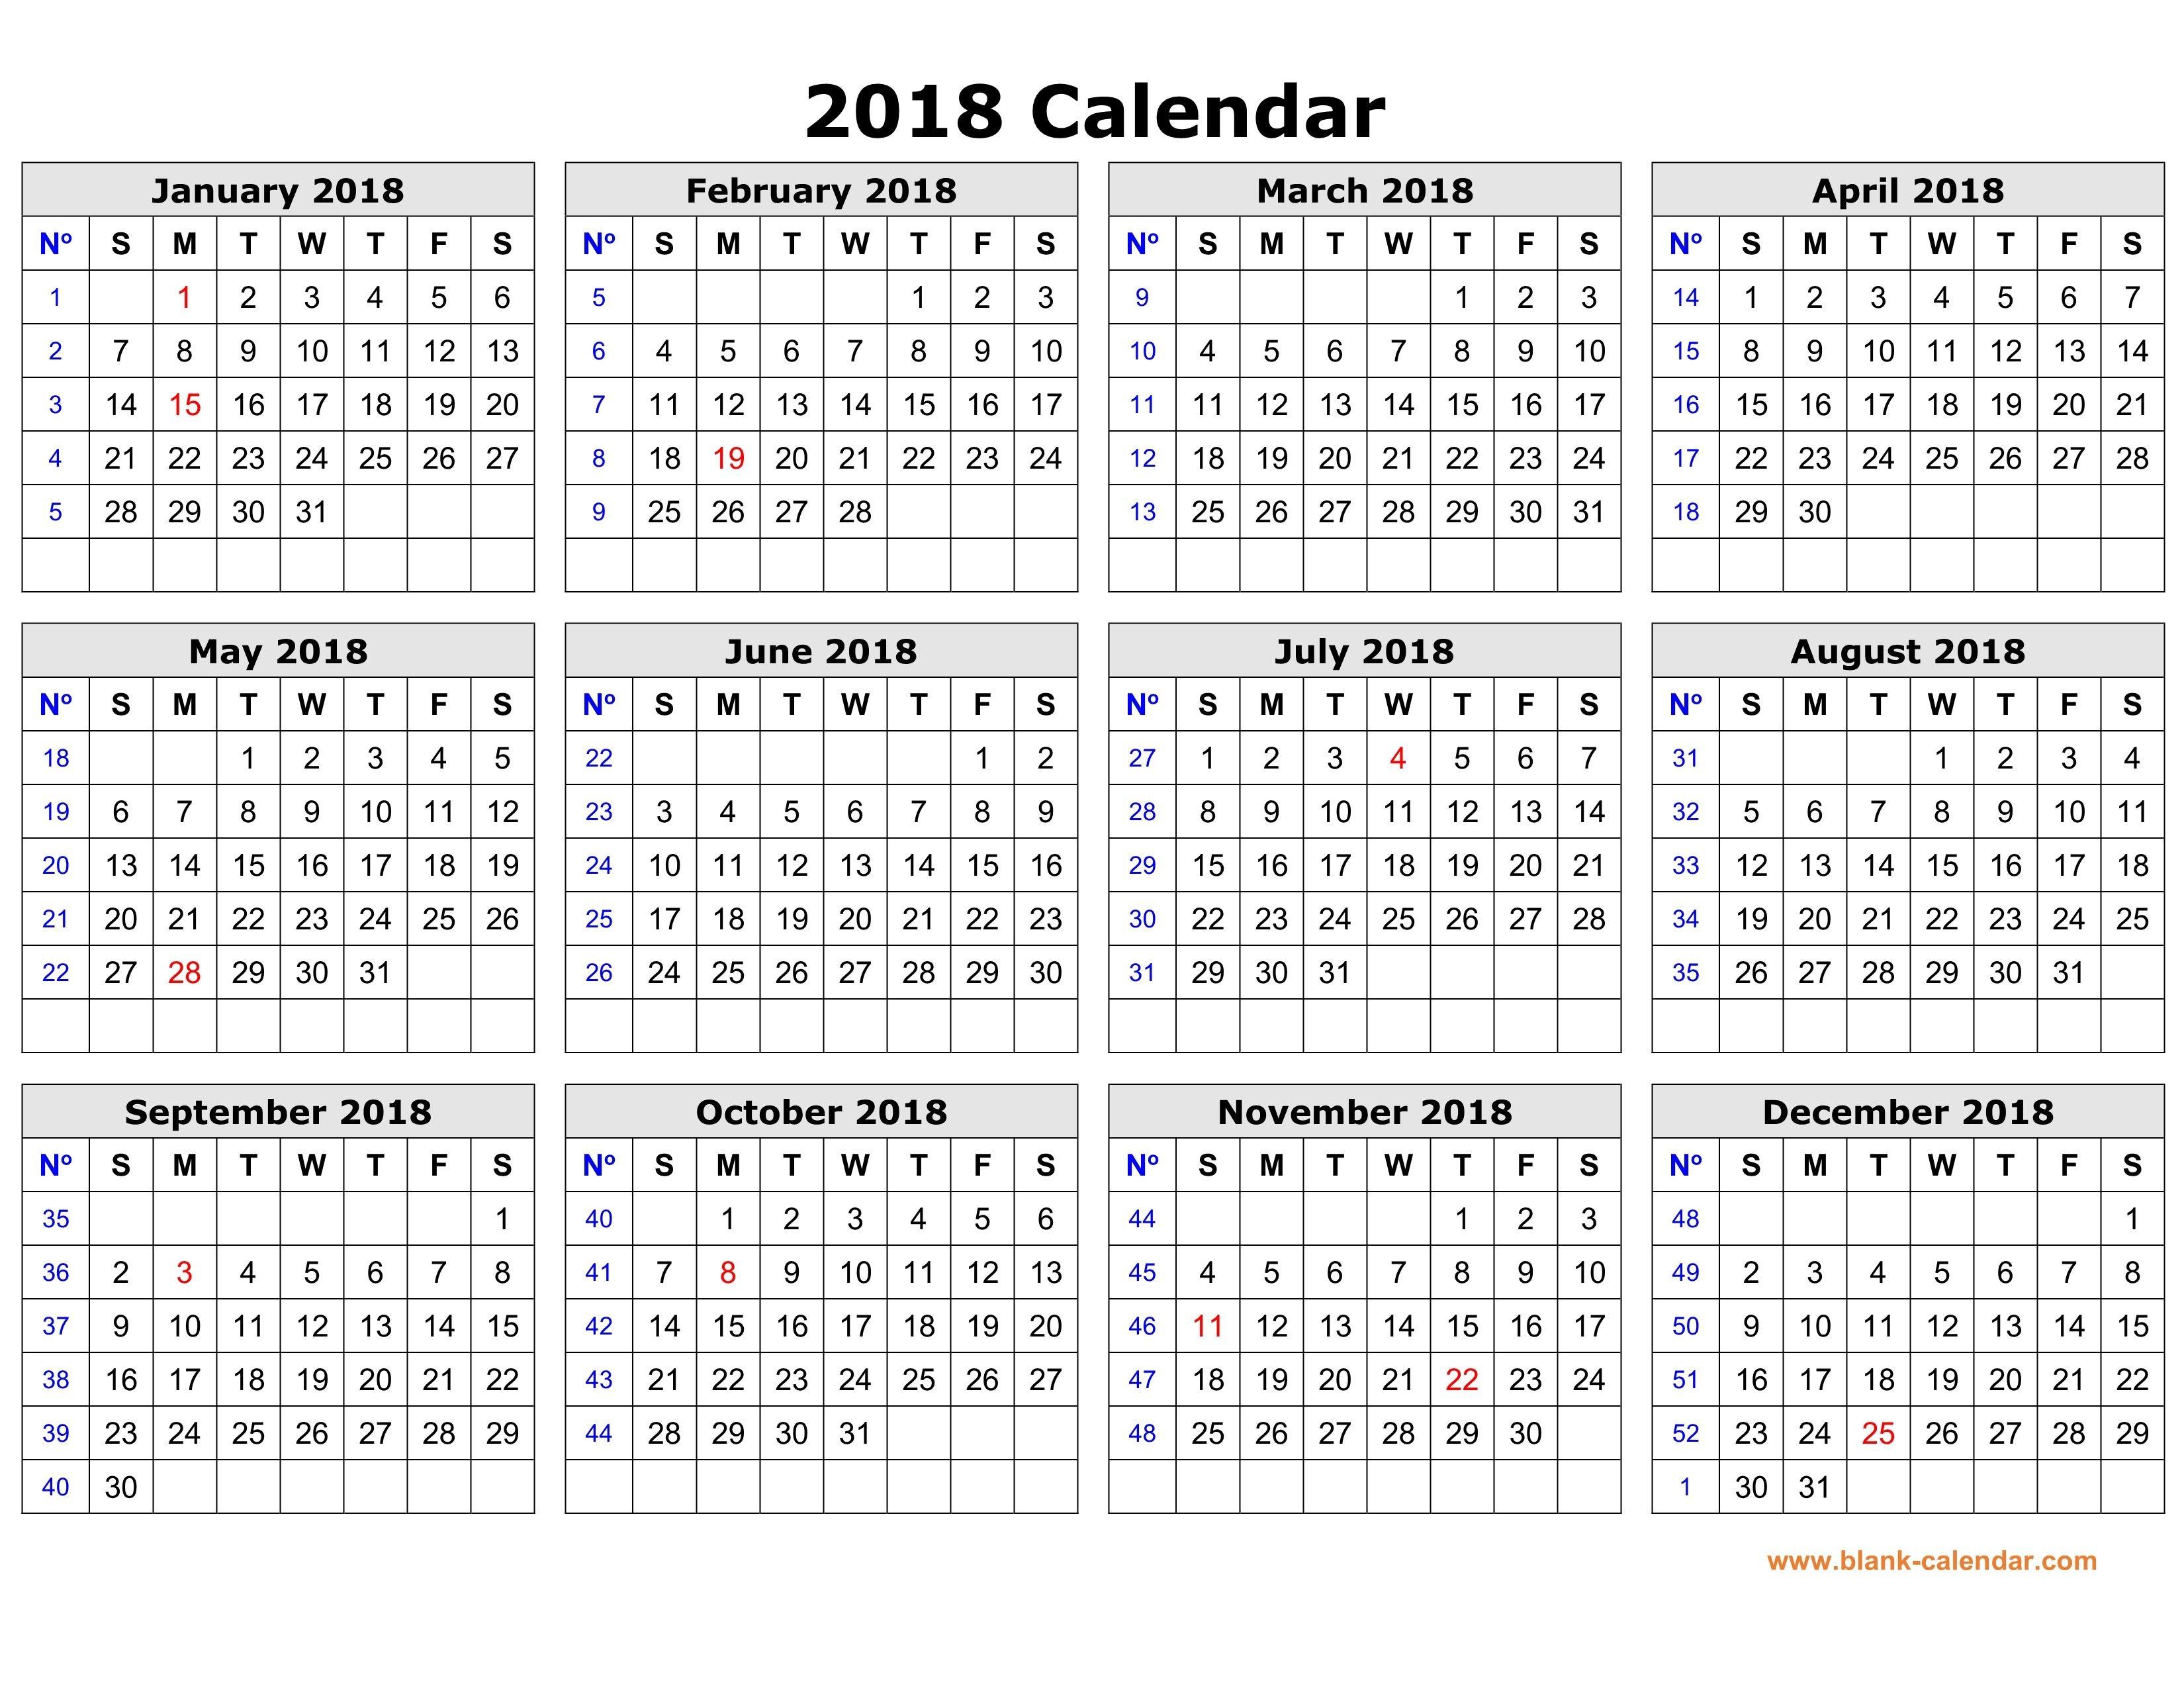 Nanakshahi Calendar March 2019 Más Actual Pin by Dhanapal Dhanapal On 18 Of Nanakshahi Calendar March 2019 Más Recientes School Year Calendars School Year Calendars